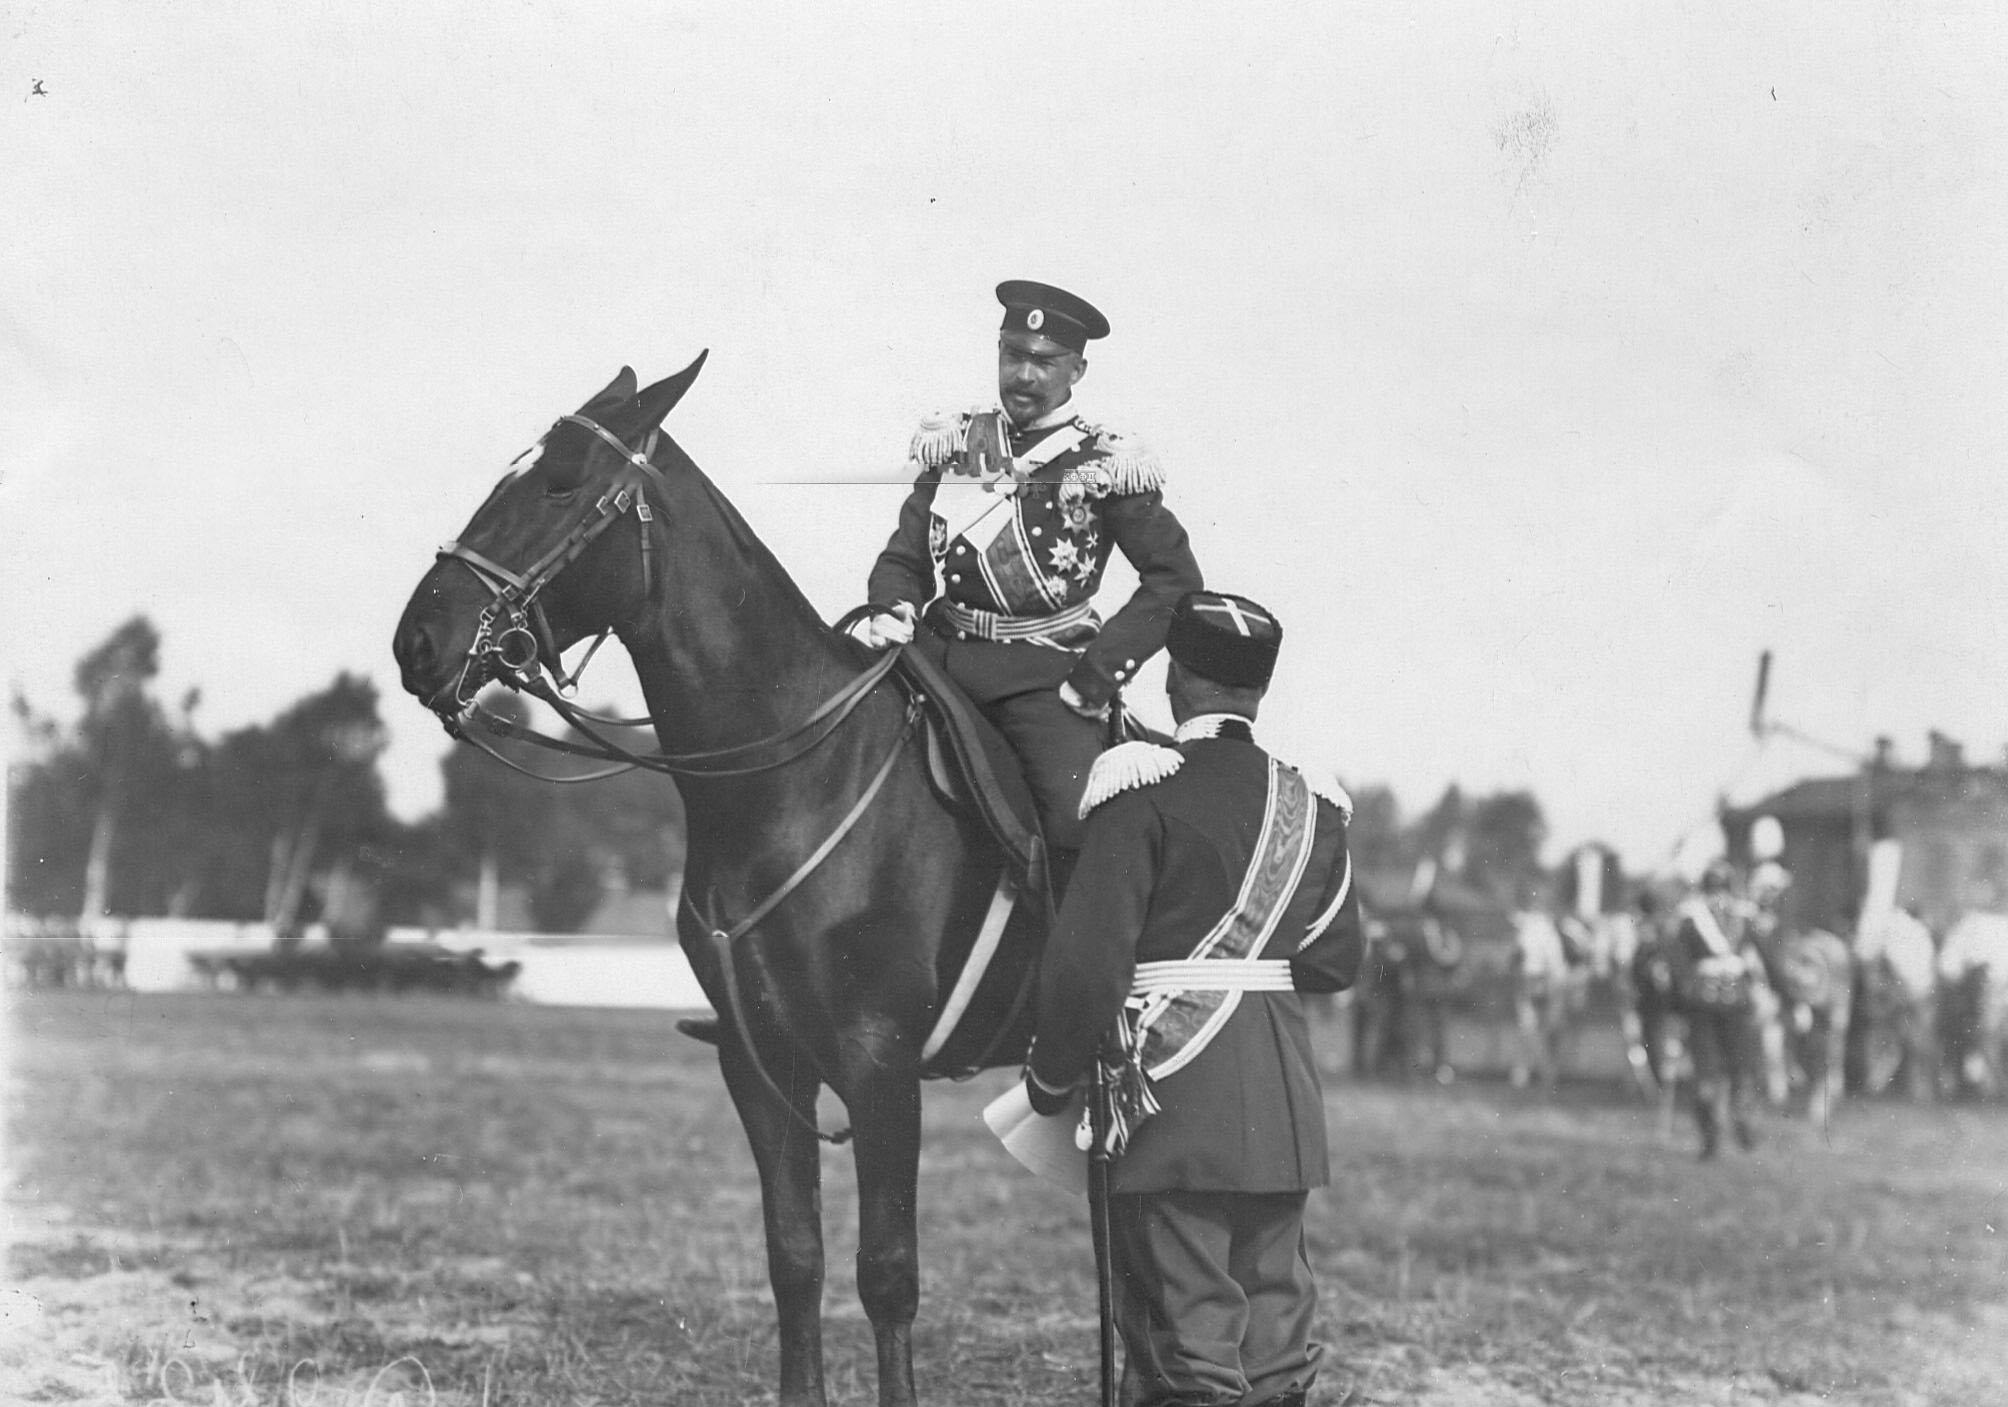 Командир полка генерал-майор Л.Н.фон Баумгартен (на коне) в день празднования 250-летнего юбилея полка